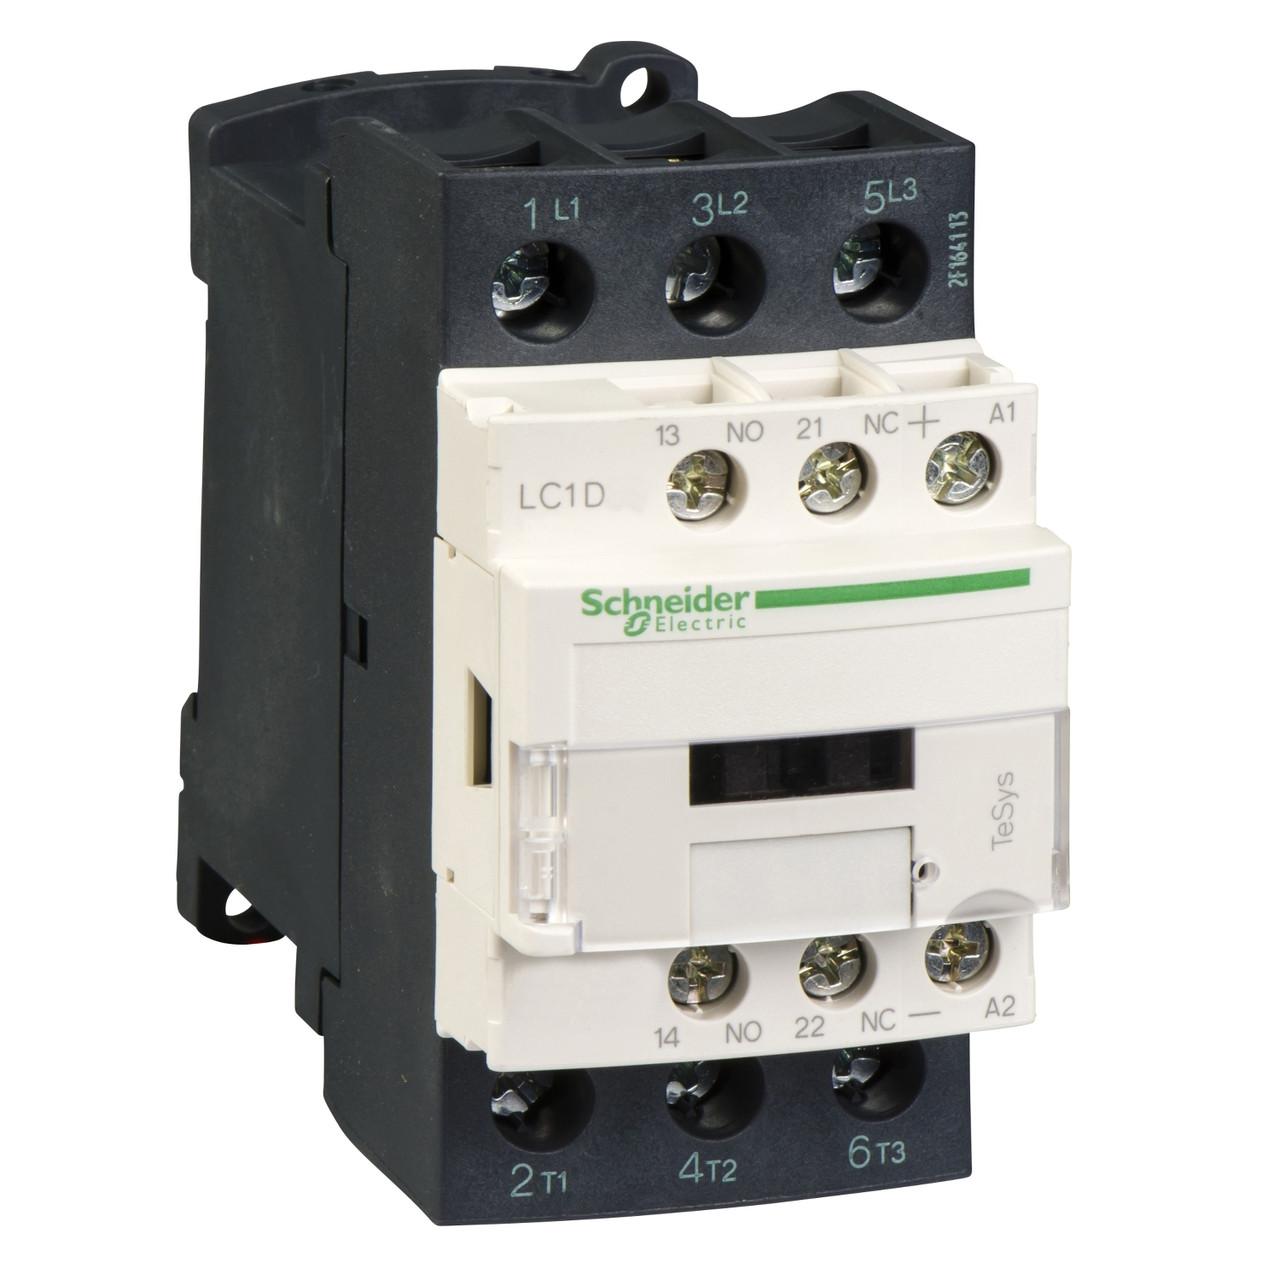 Контактор 3P 25A HO+H3 24V огран /LC1D25BD/